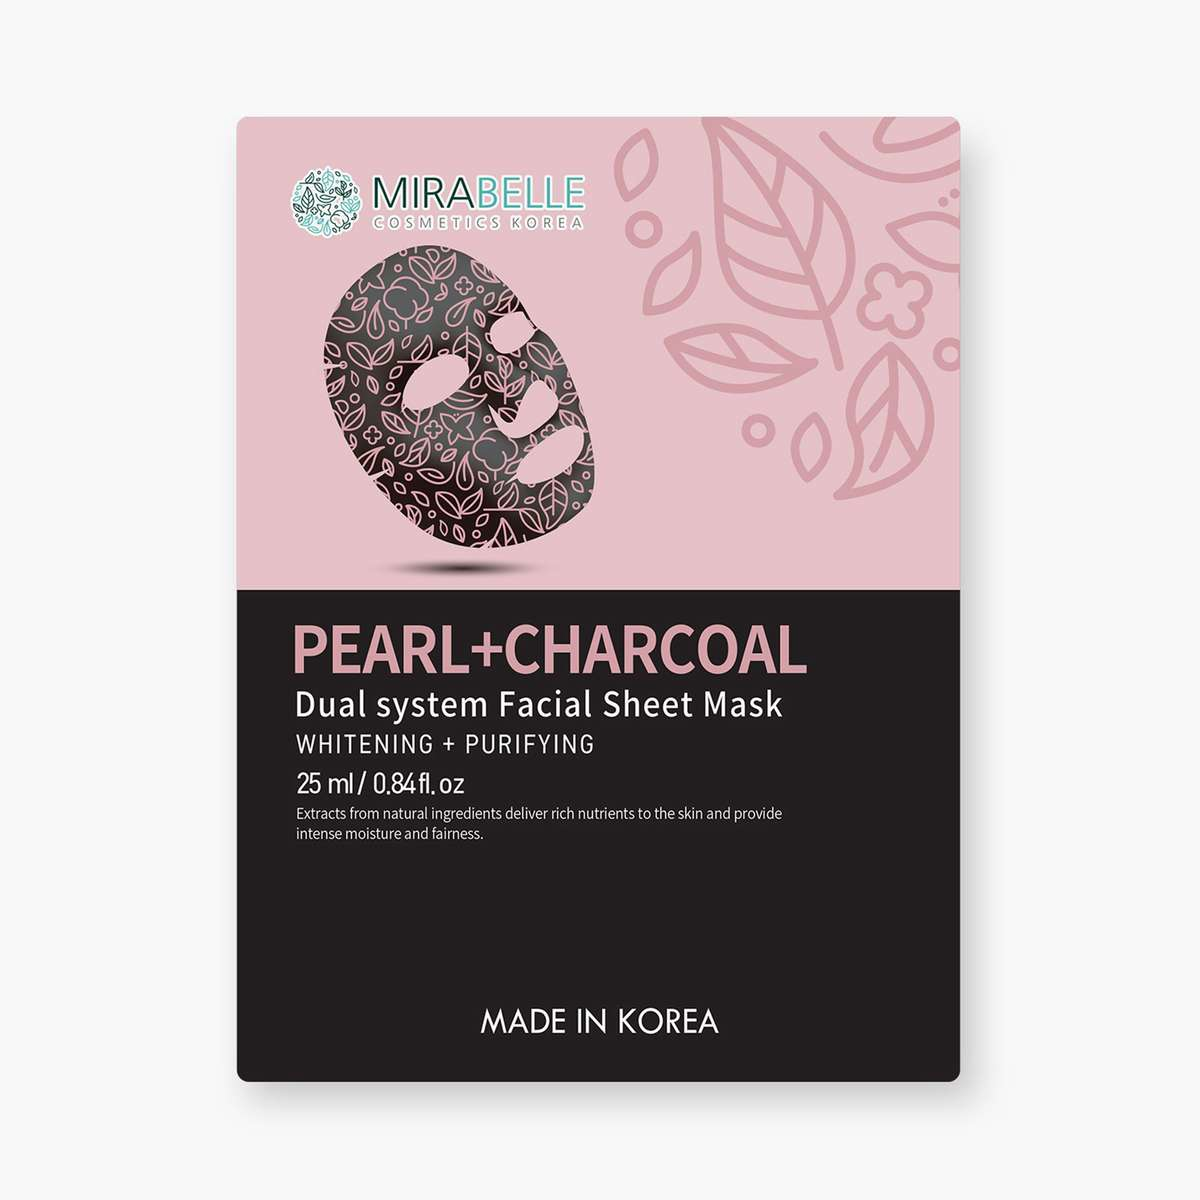 MIRABELLE Korea Dual System Facial Sheet Mask- Pearl + Charcoal